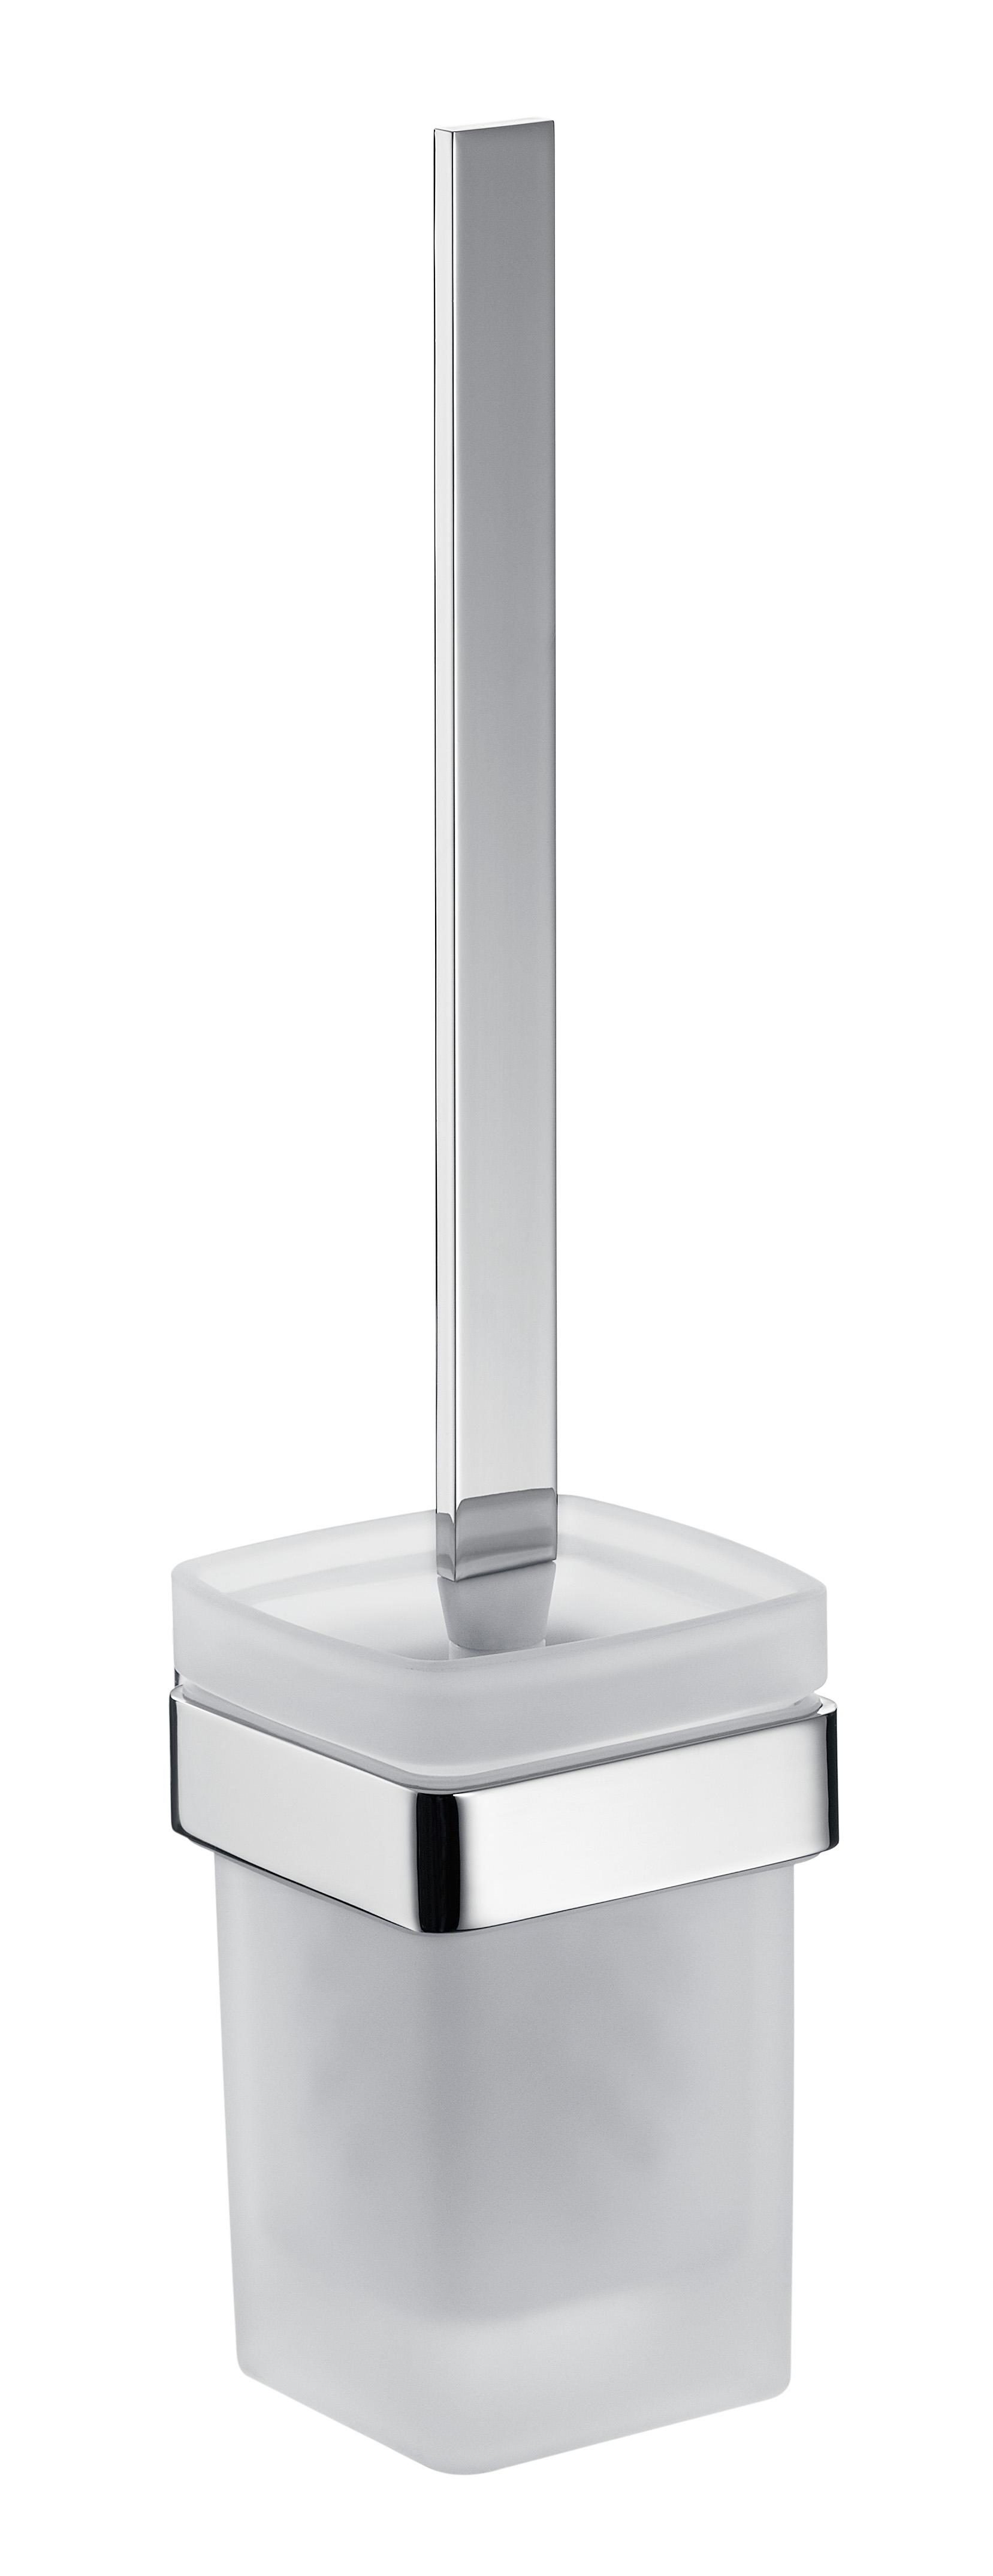 Emco loft Bürstengarnitur Kristallglas satiniert chrom